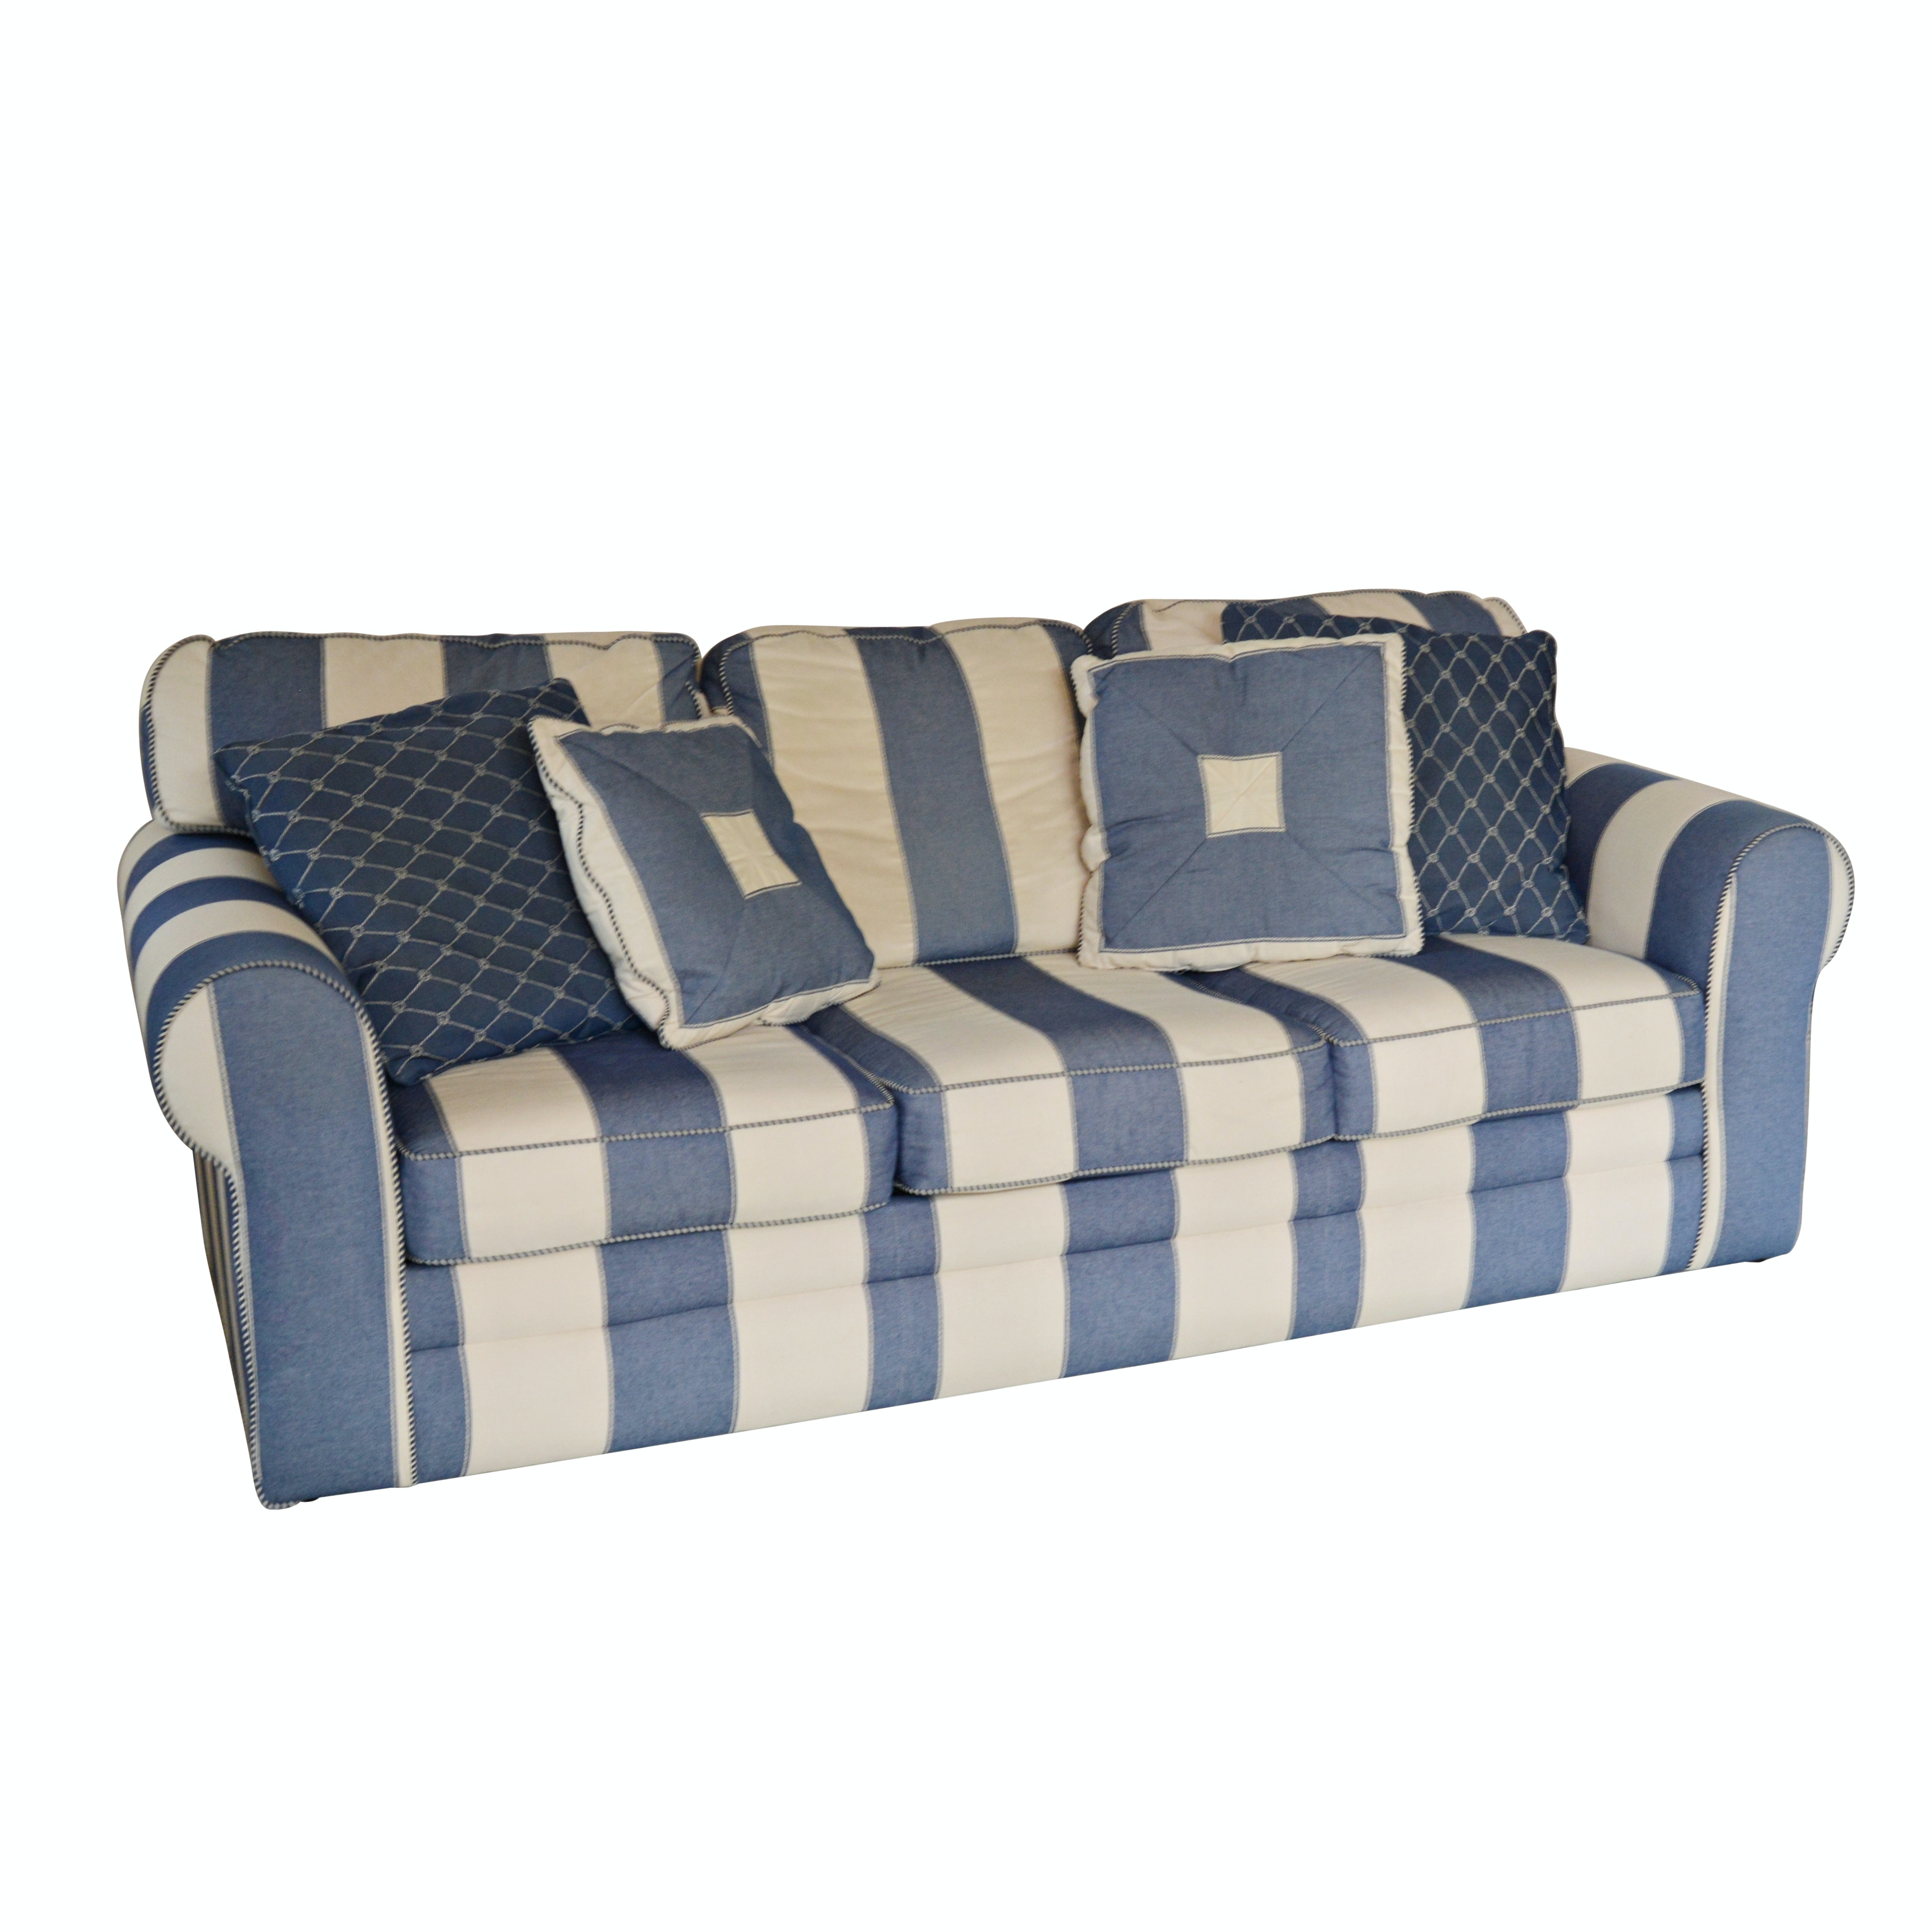 Denim Blue and Cream Striped Sofa by J.G. Hook for Bassett Furniture